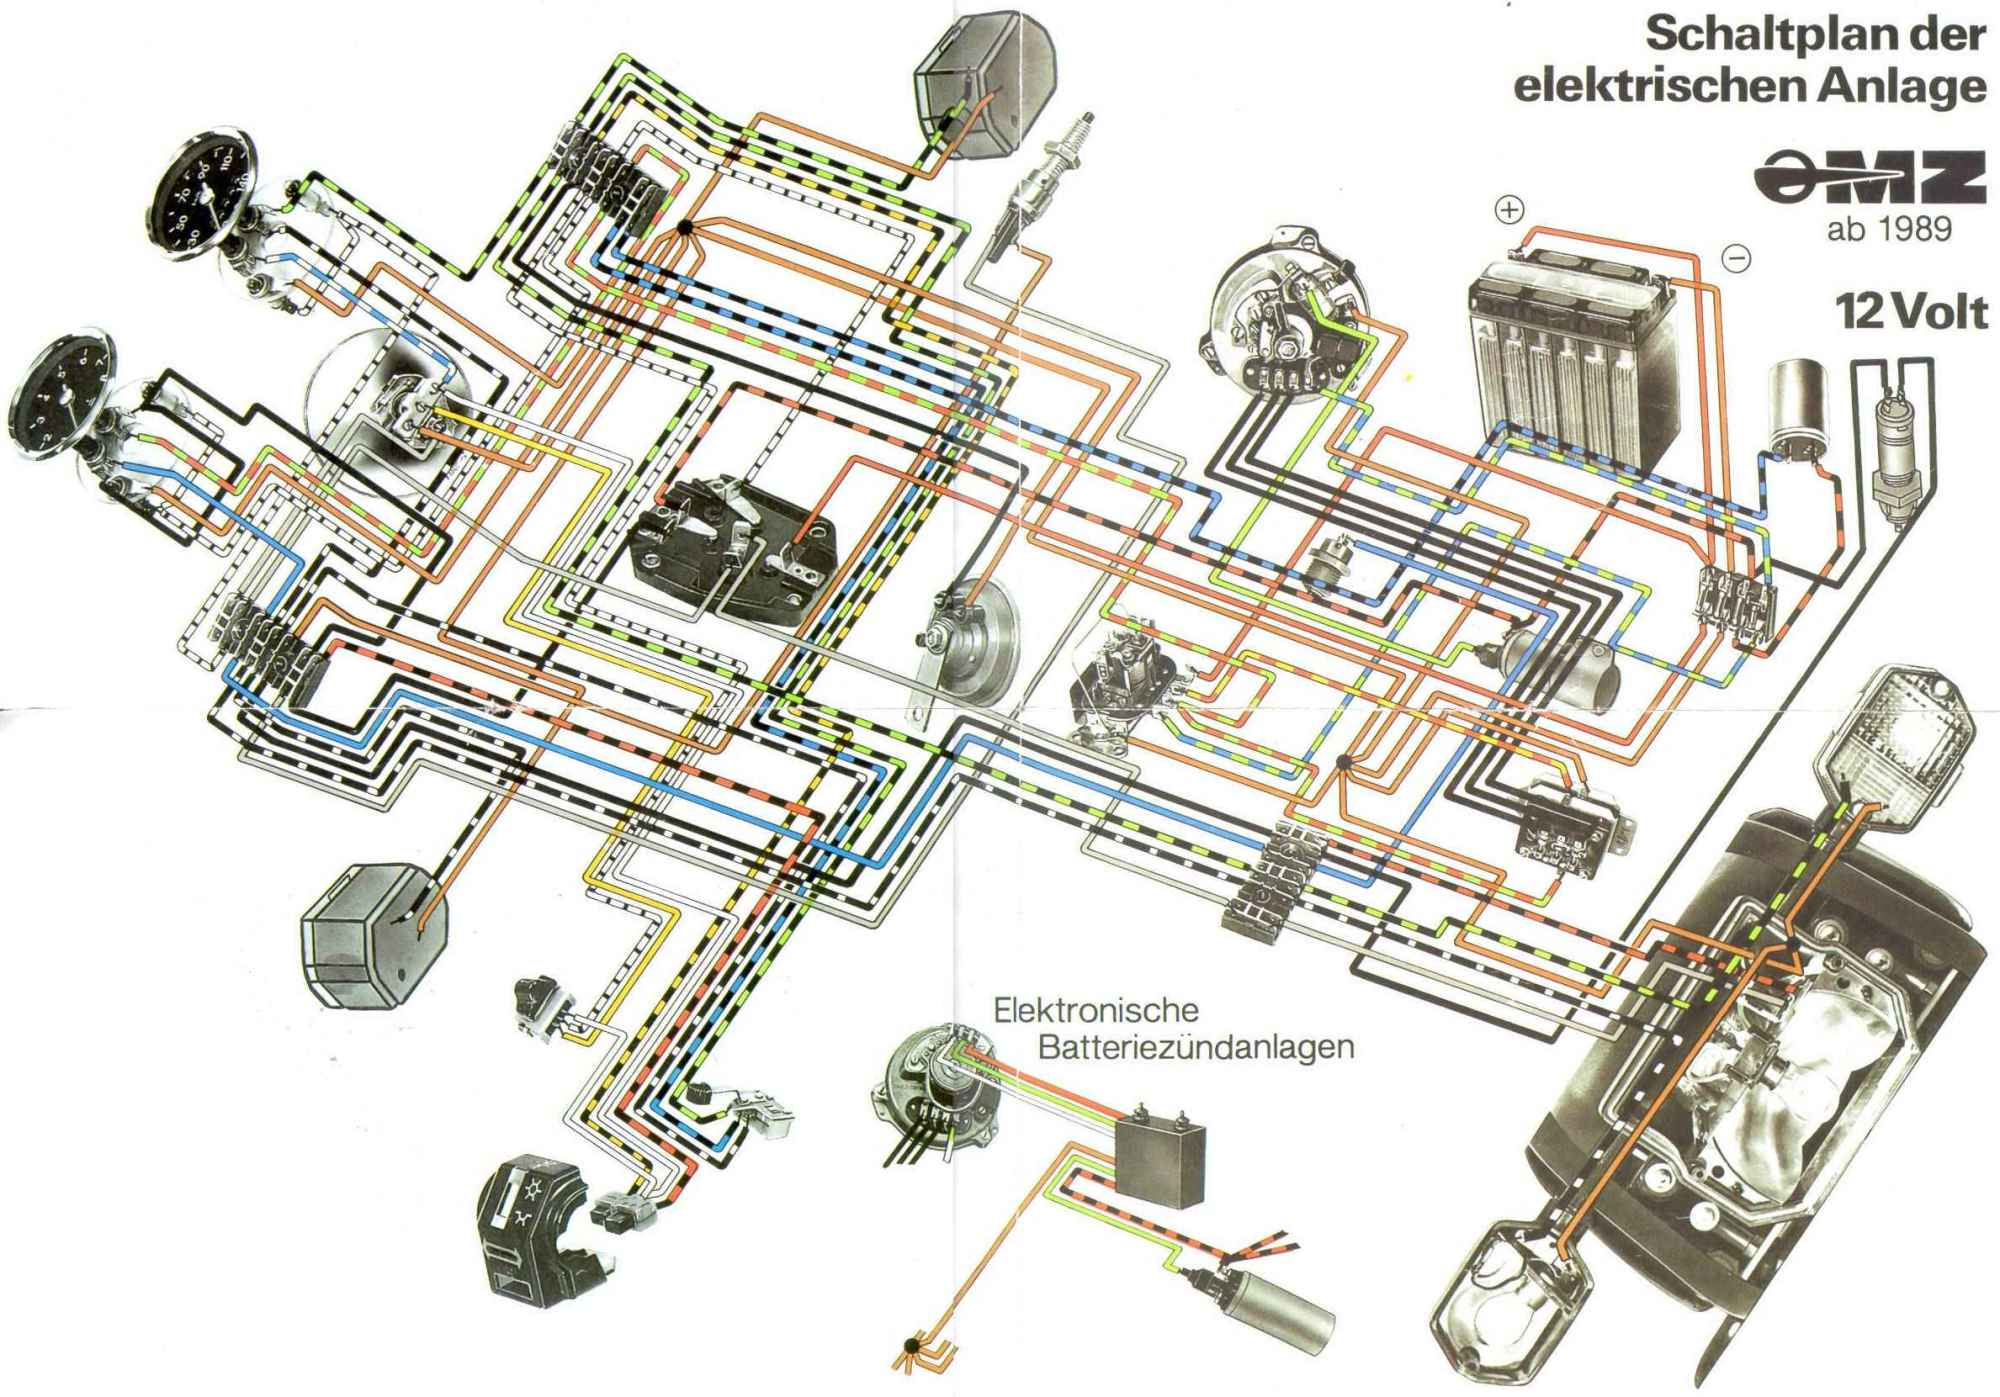 hight resolution of http www mz cx technik elektrik schaltplan 12v l jpg